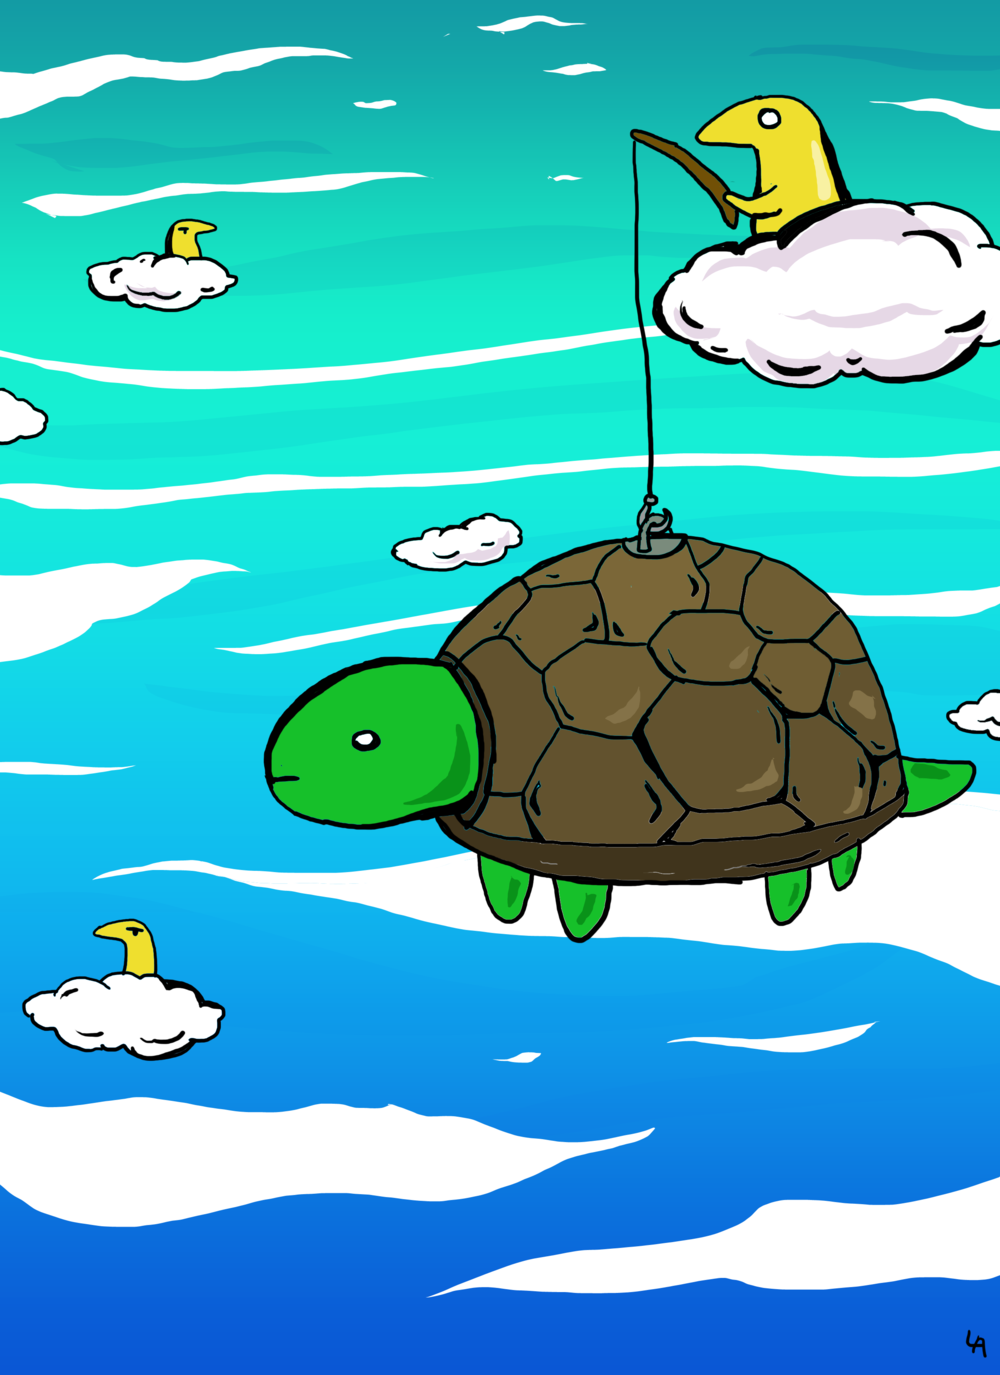 turtle cloud2.png